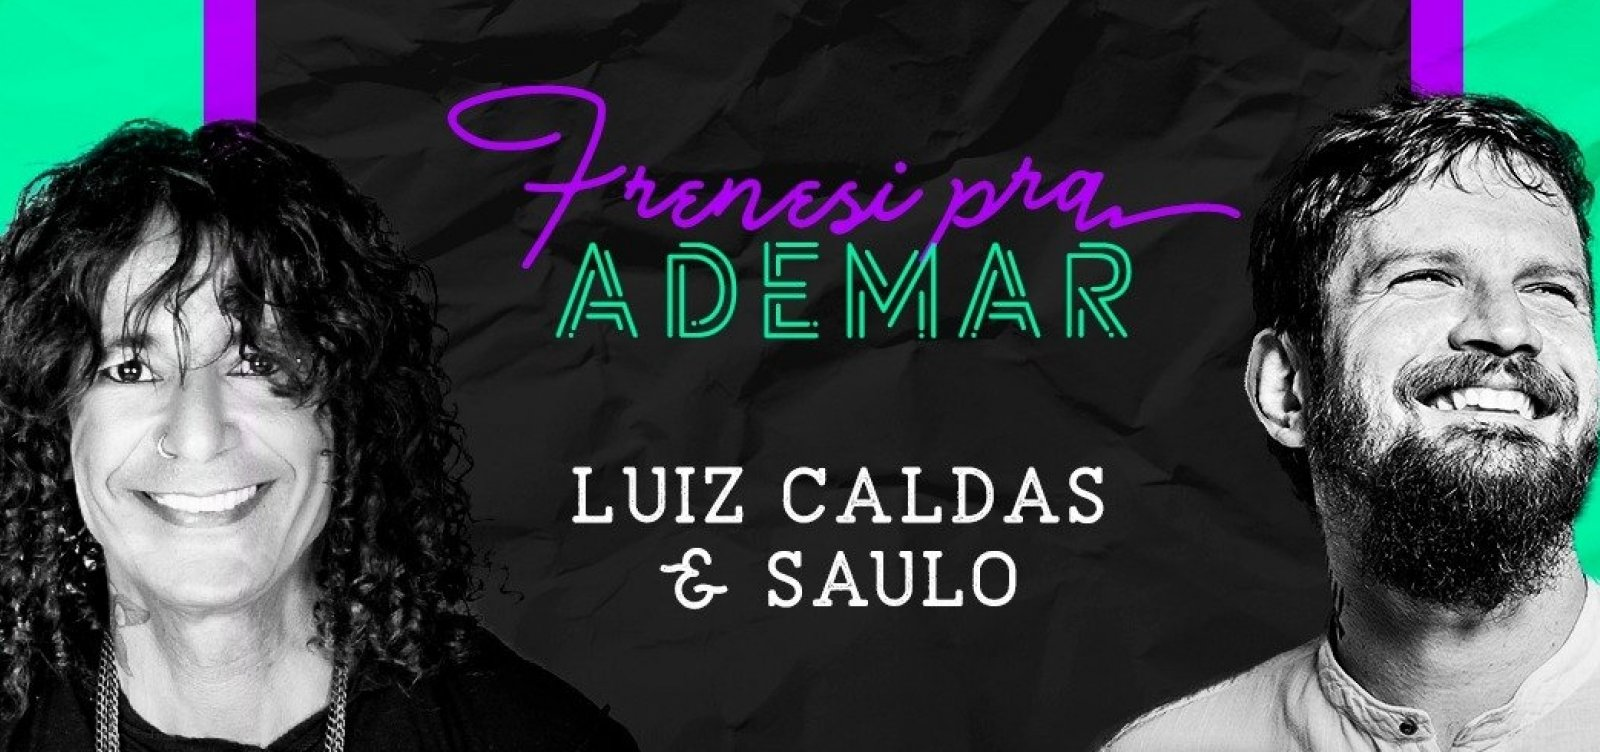 [Show 'Frenesi para Ademar' será transmitido no YouTube]